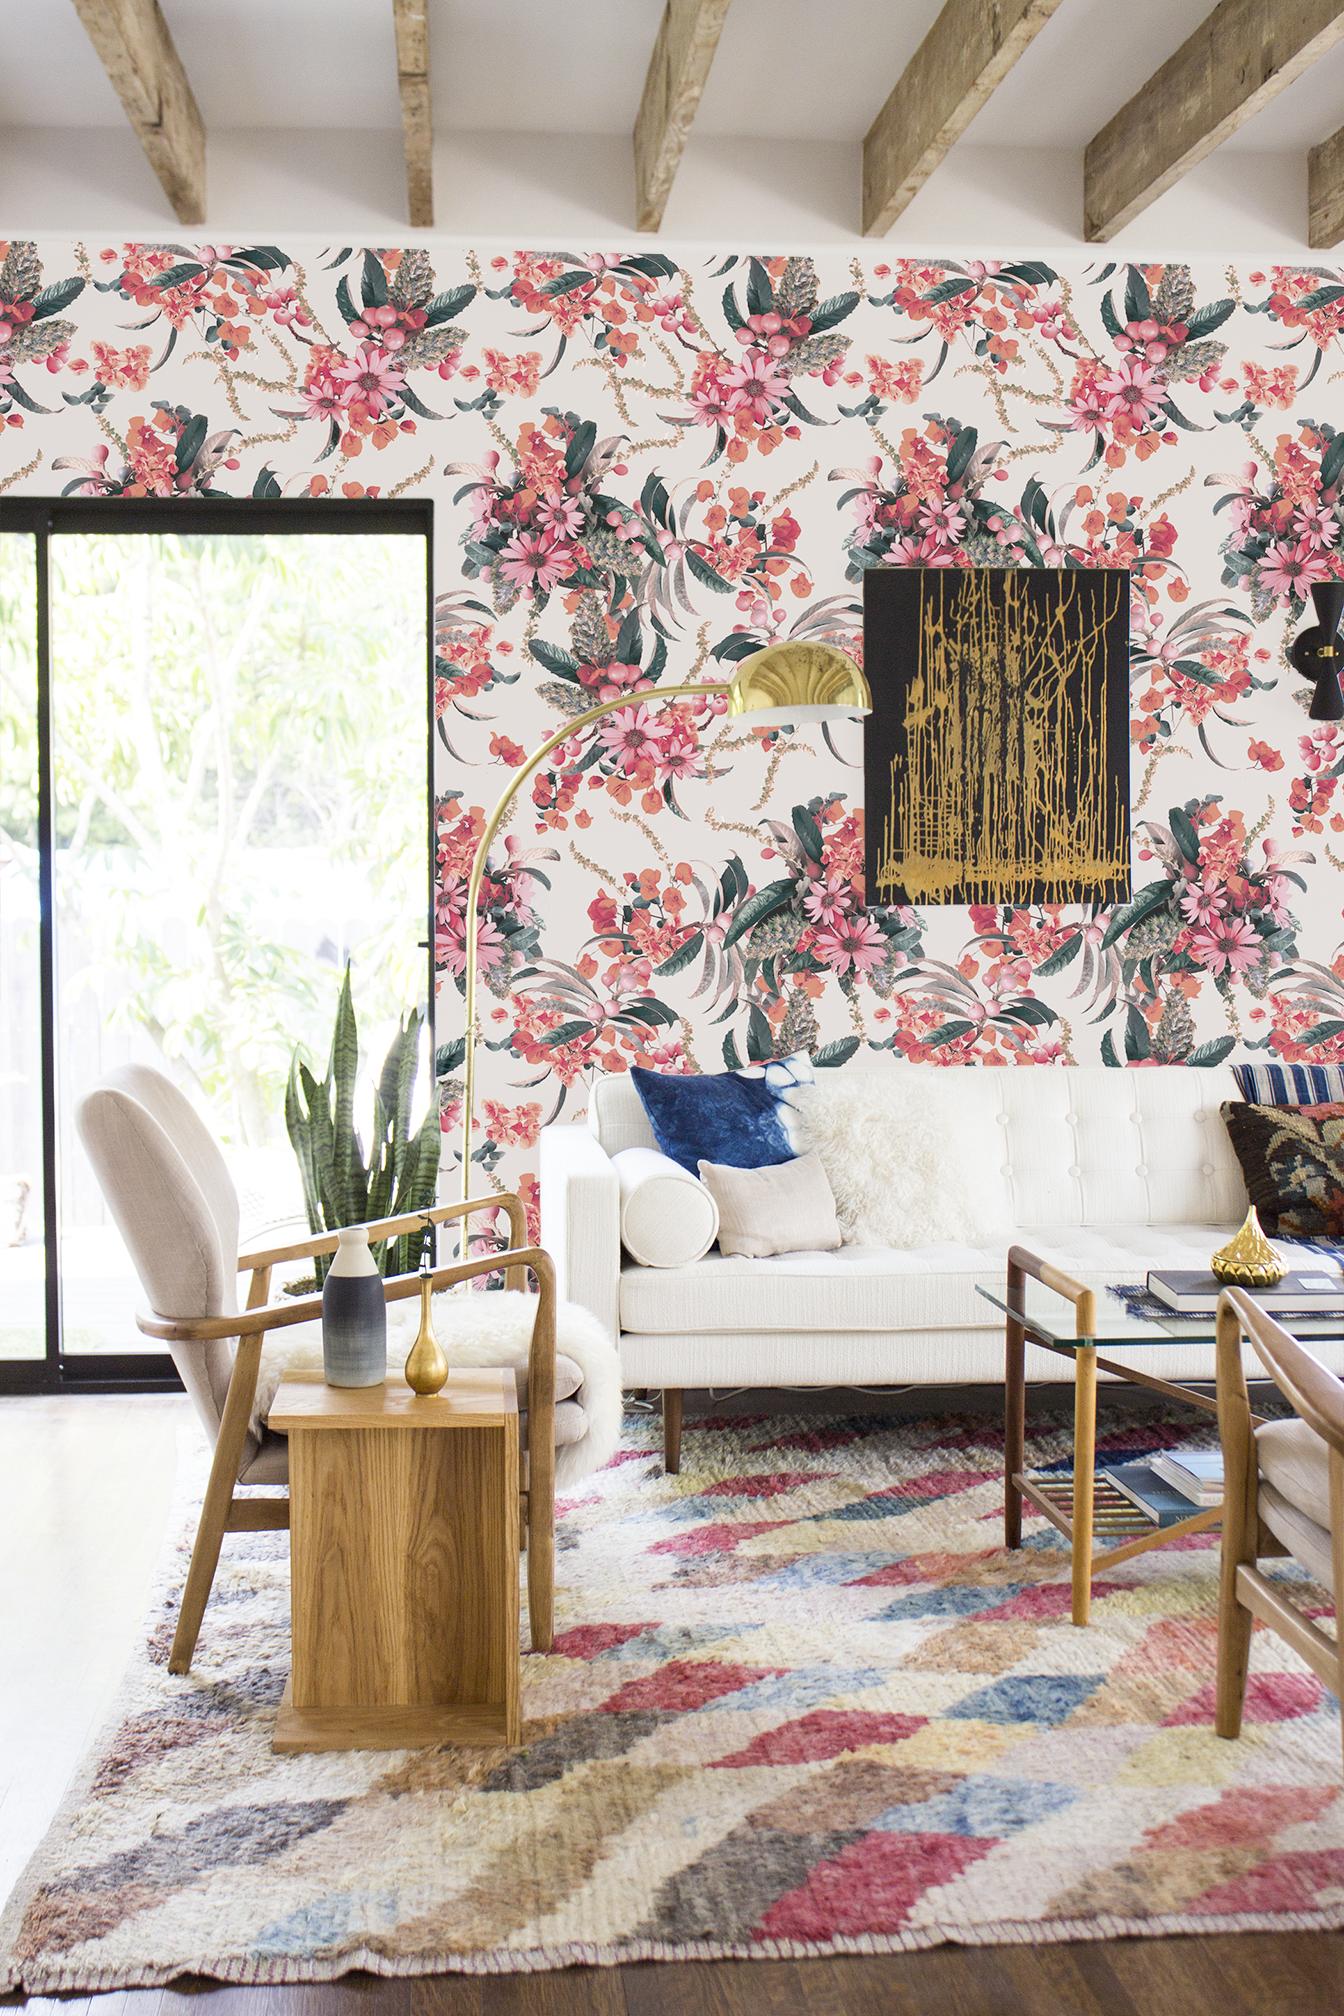 livingroom wallpaper examples_02.png